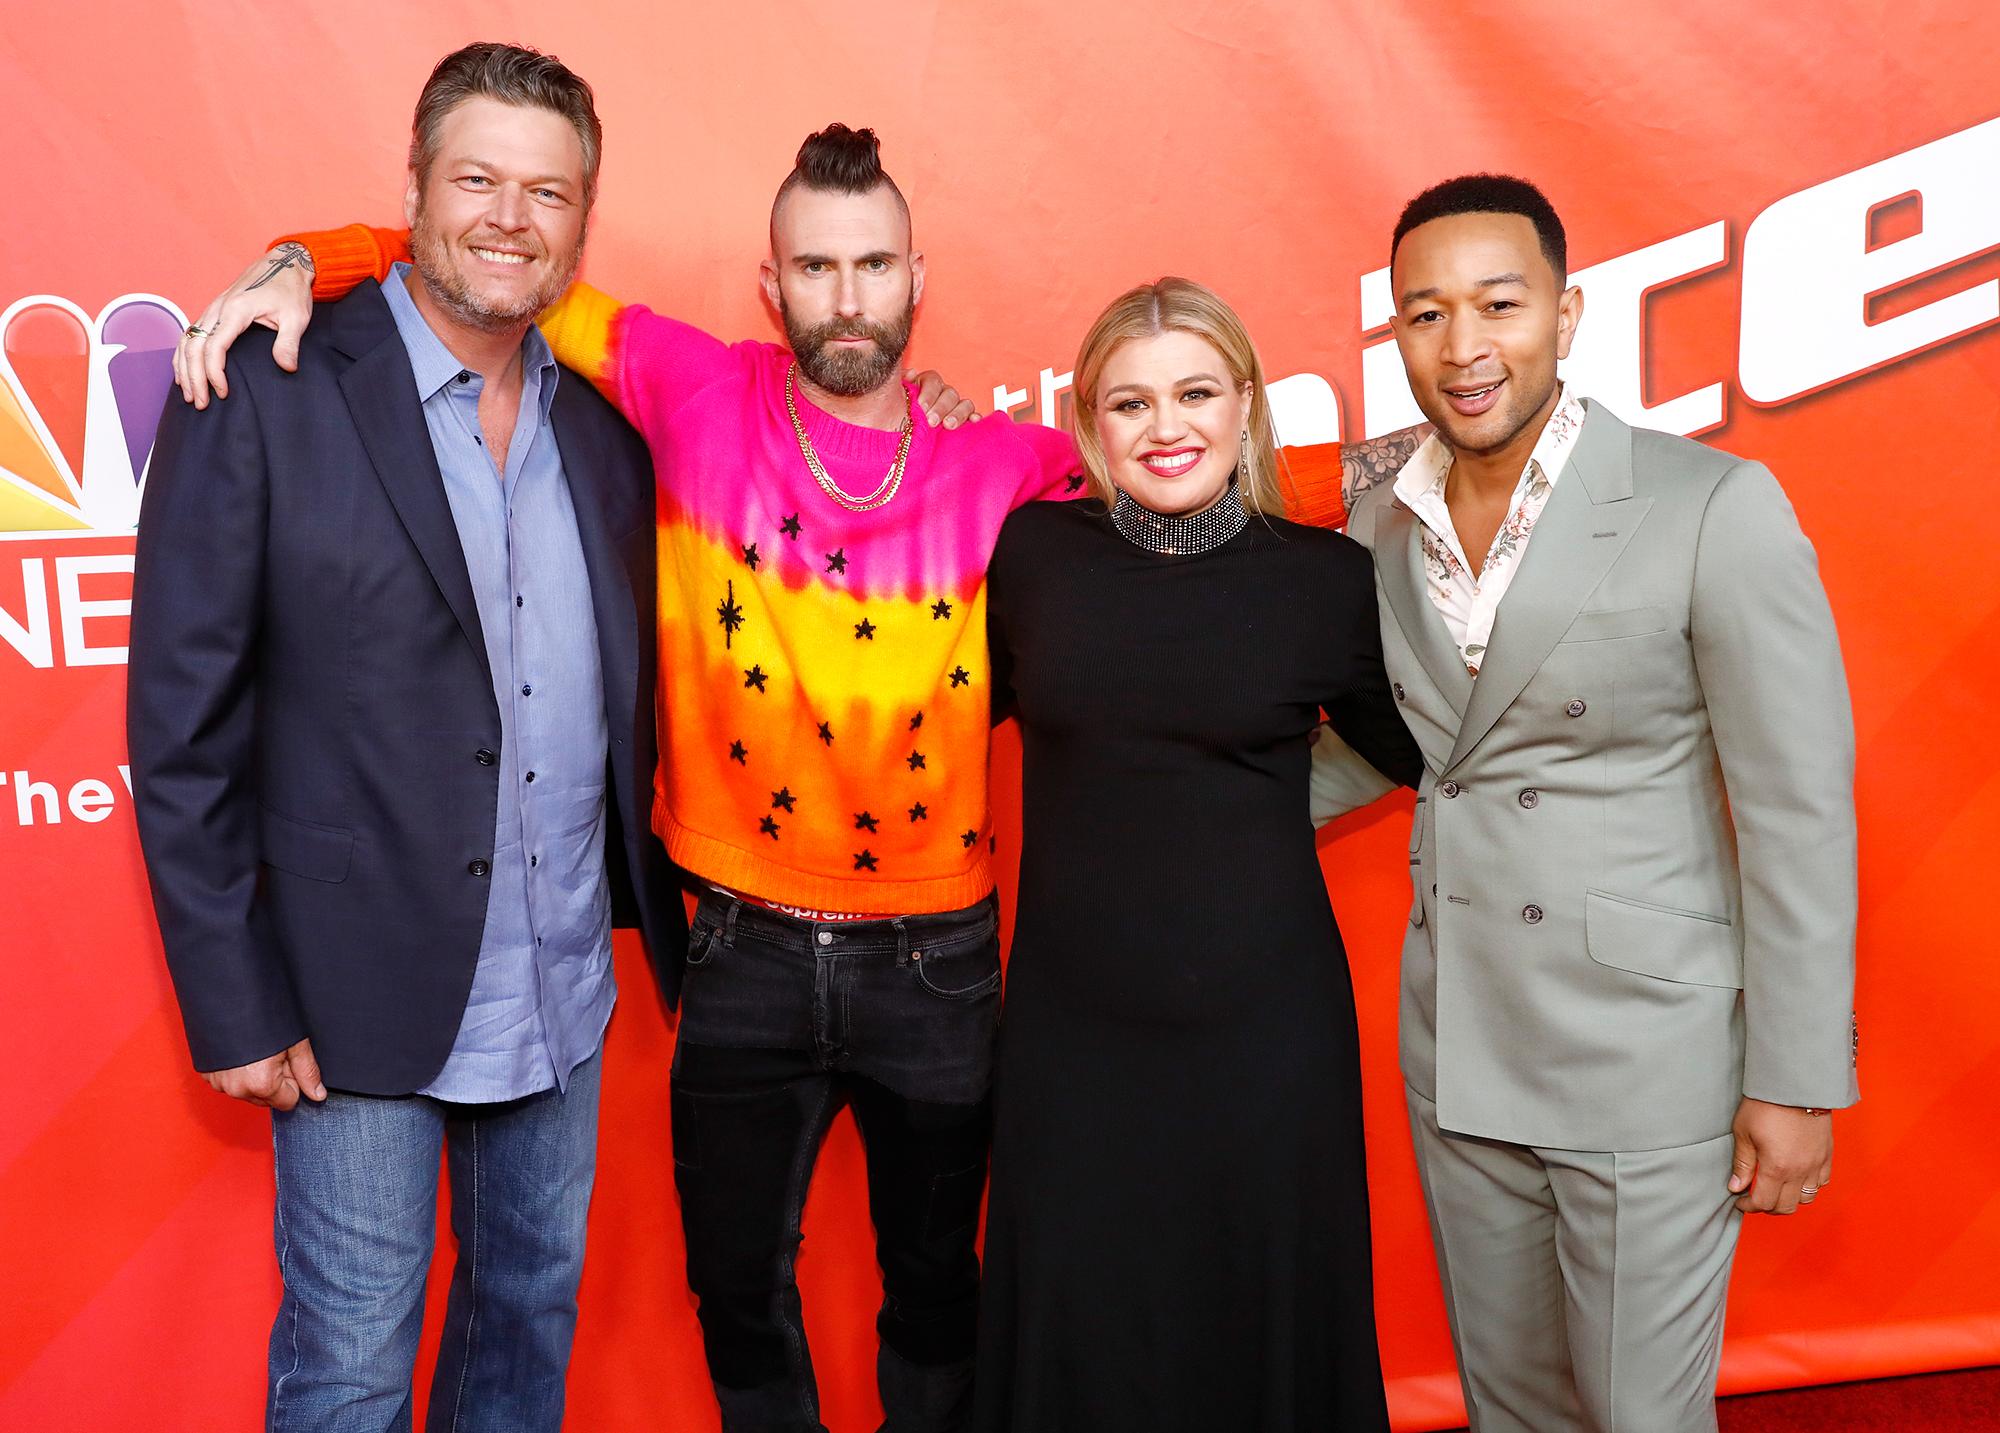 Blake Shelton, Adam Levine, Kelly Clarkson, and John Legend